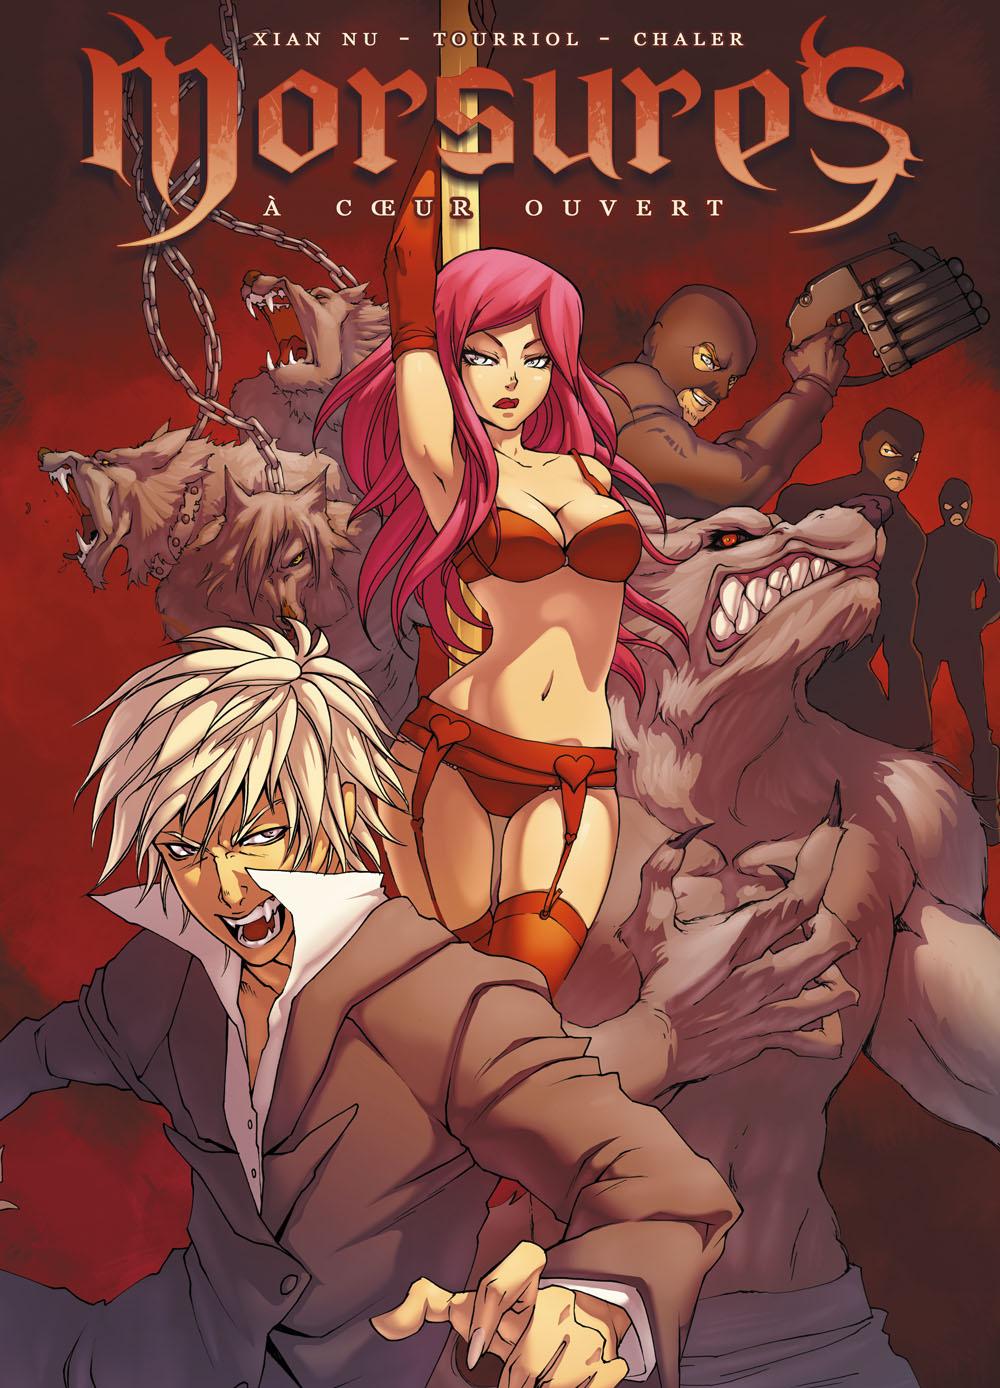 BD vampirique : Morsures par Tourriol & Xian Nu.